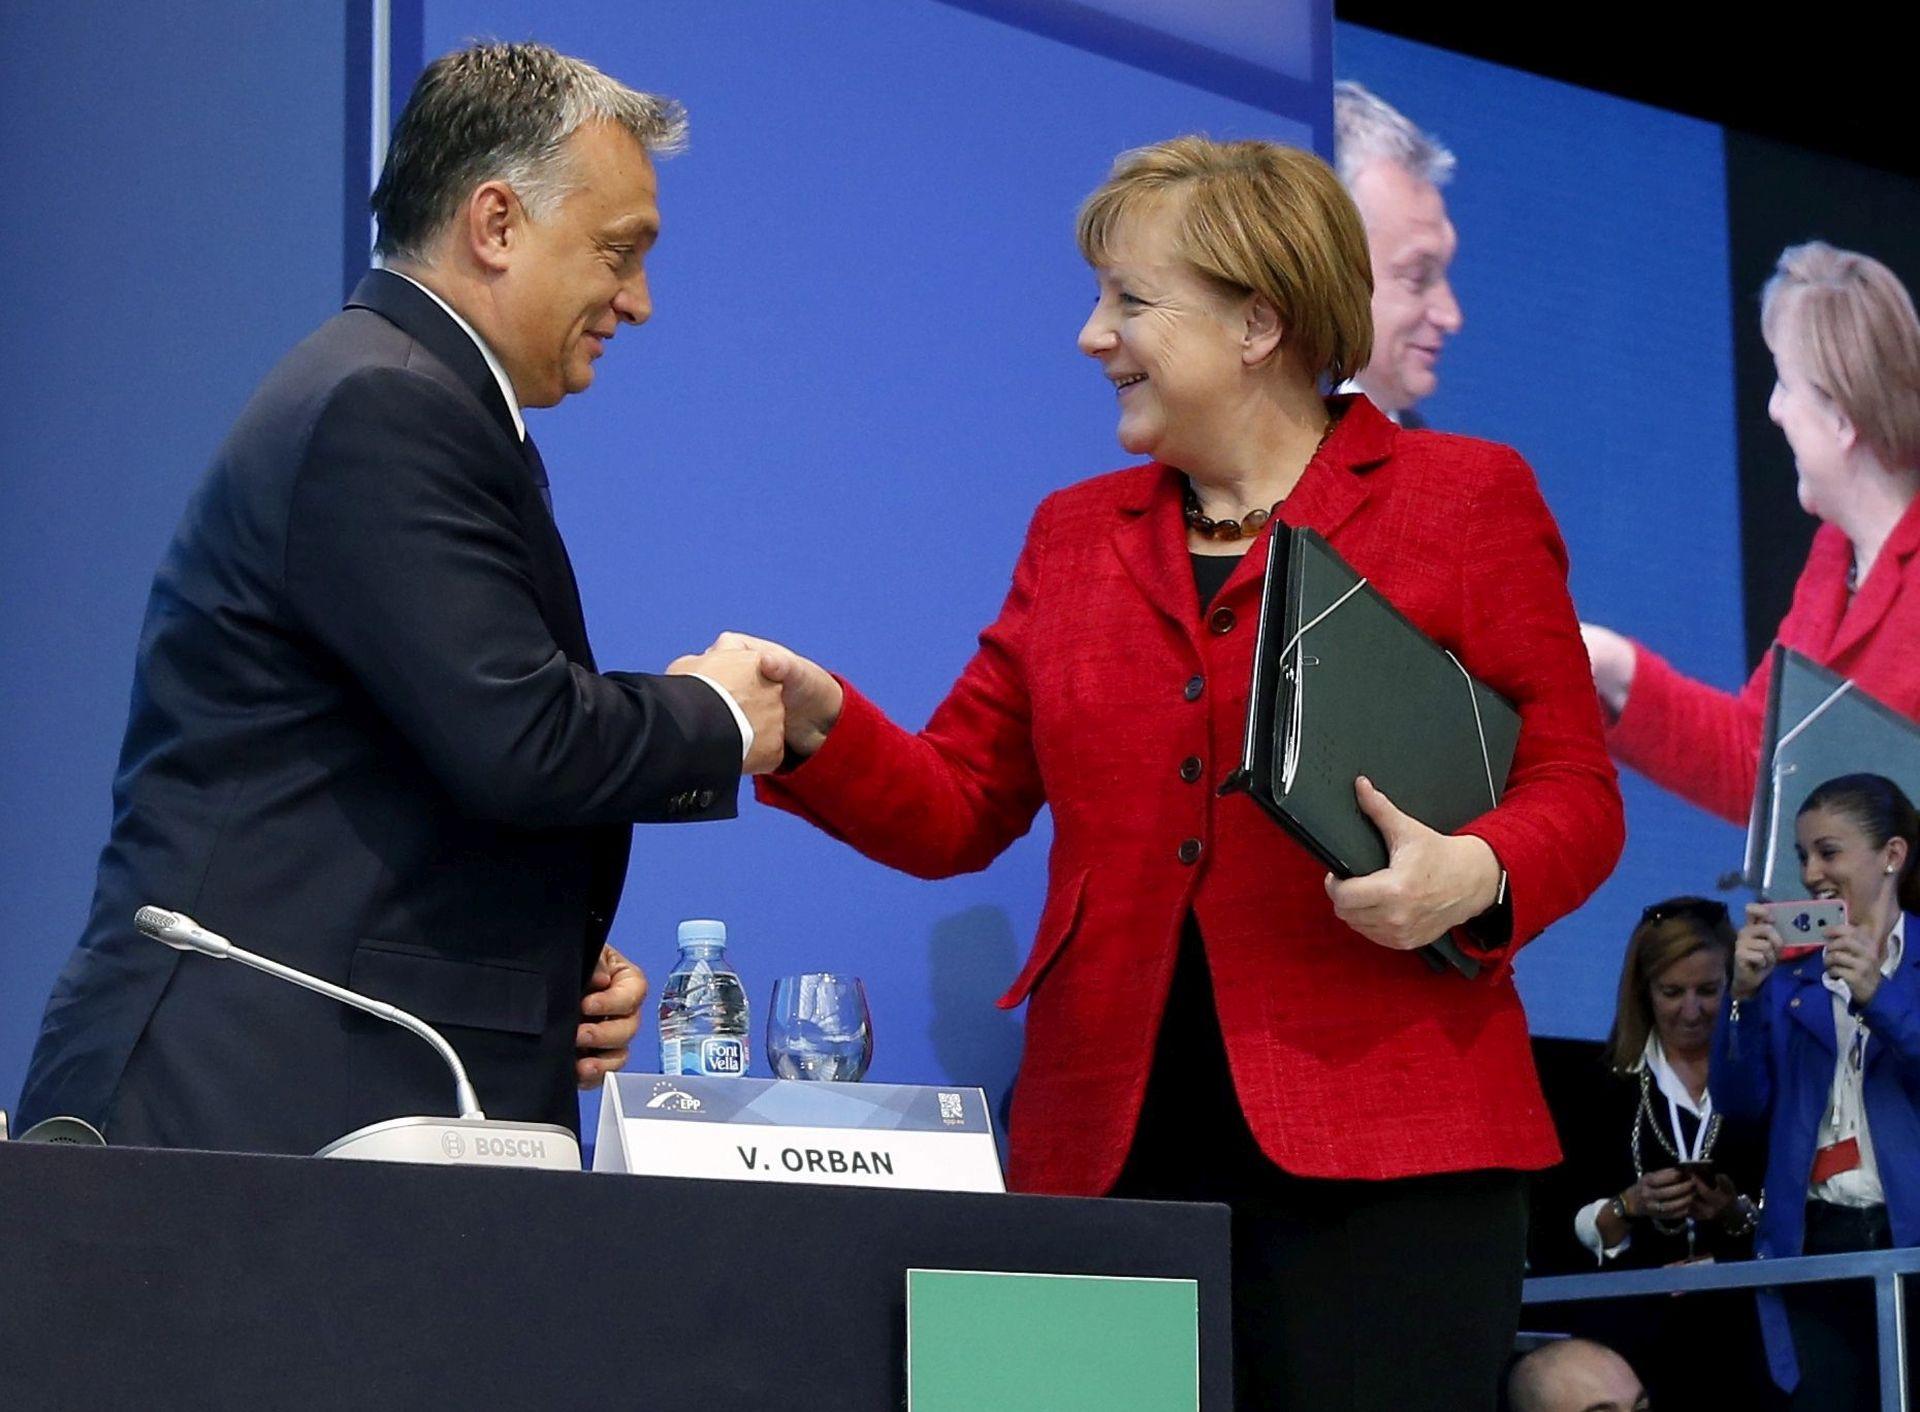 VIKTOR ORBAN Europa je trenutno bogata i slaba, a to je moguća najopasnija situacija